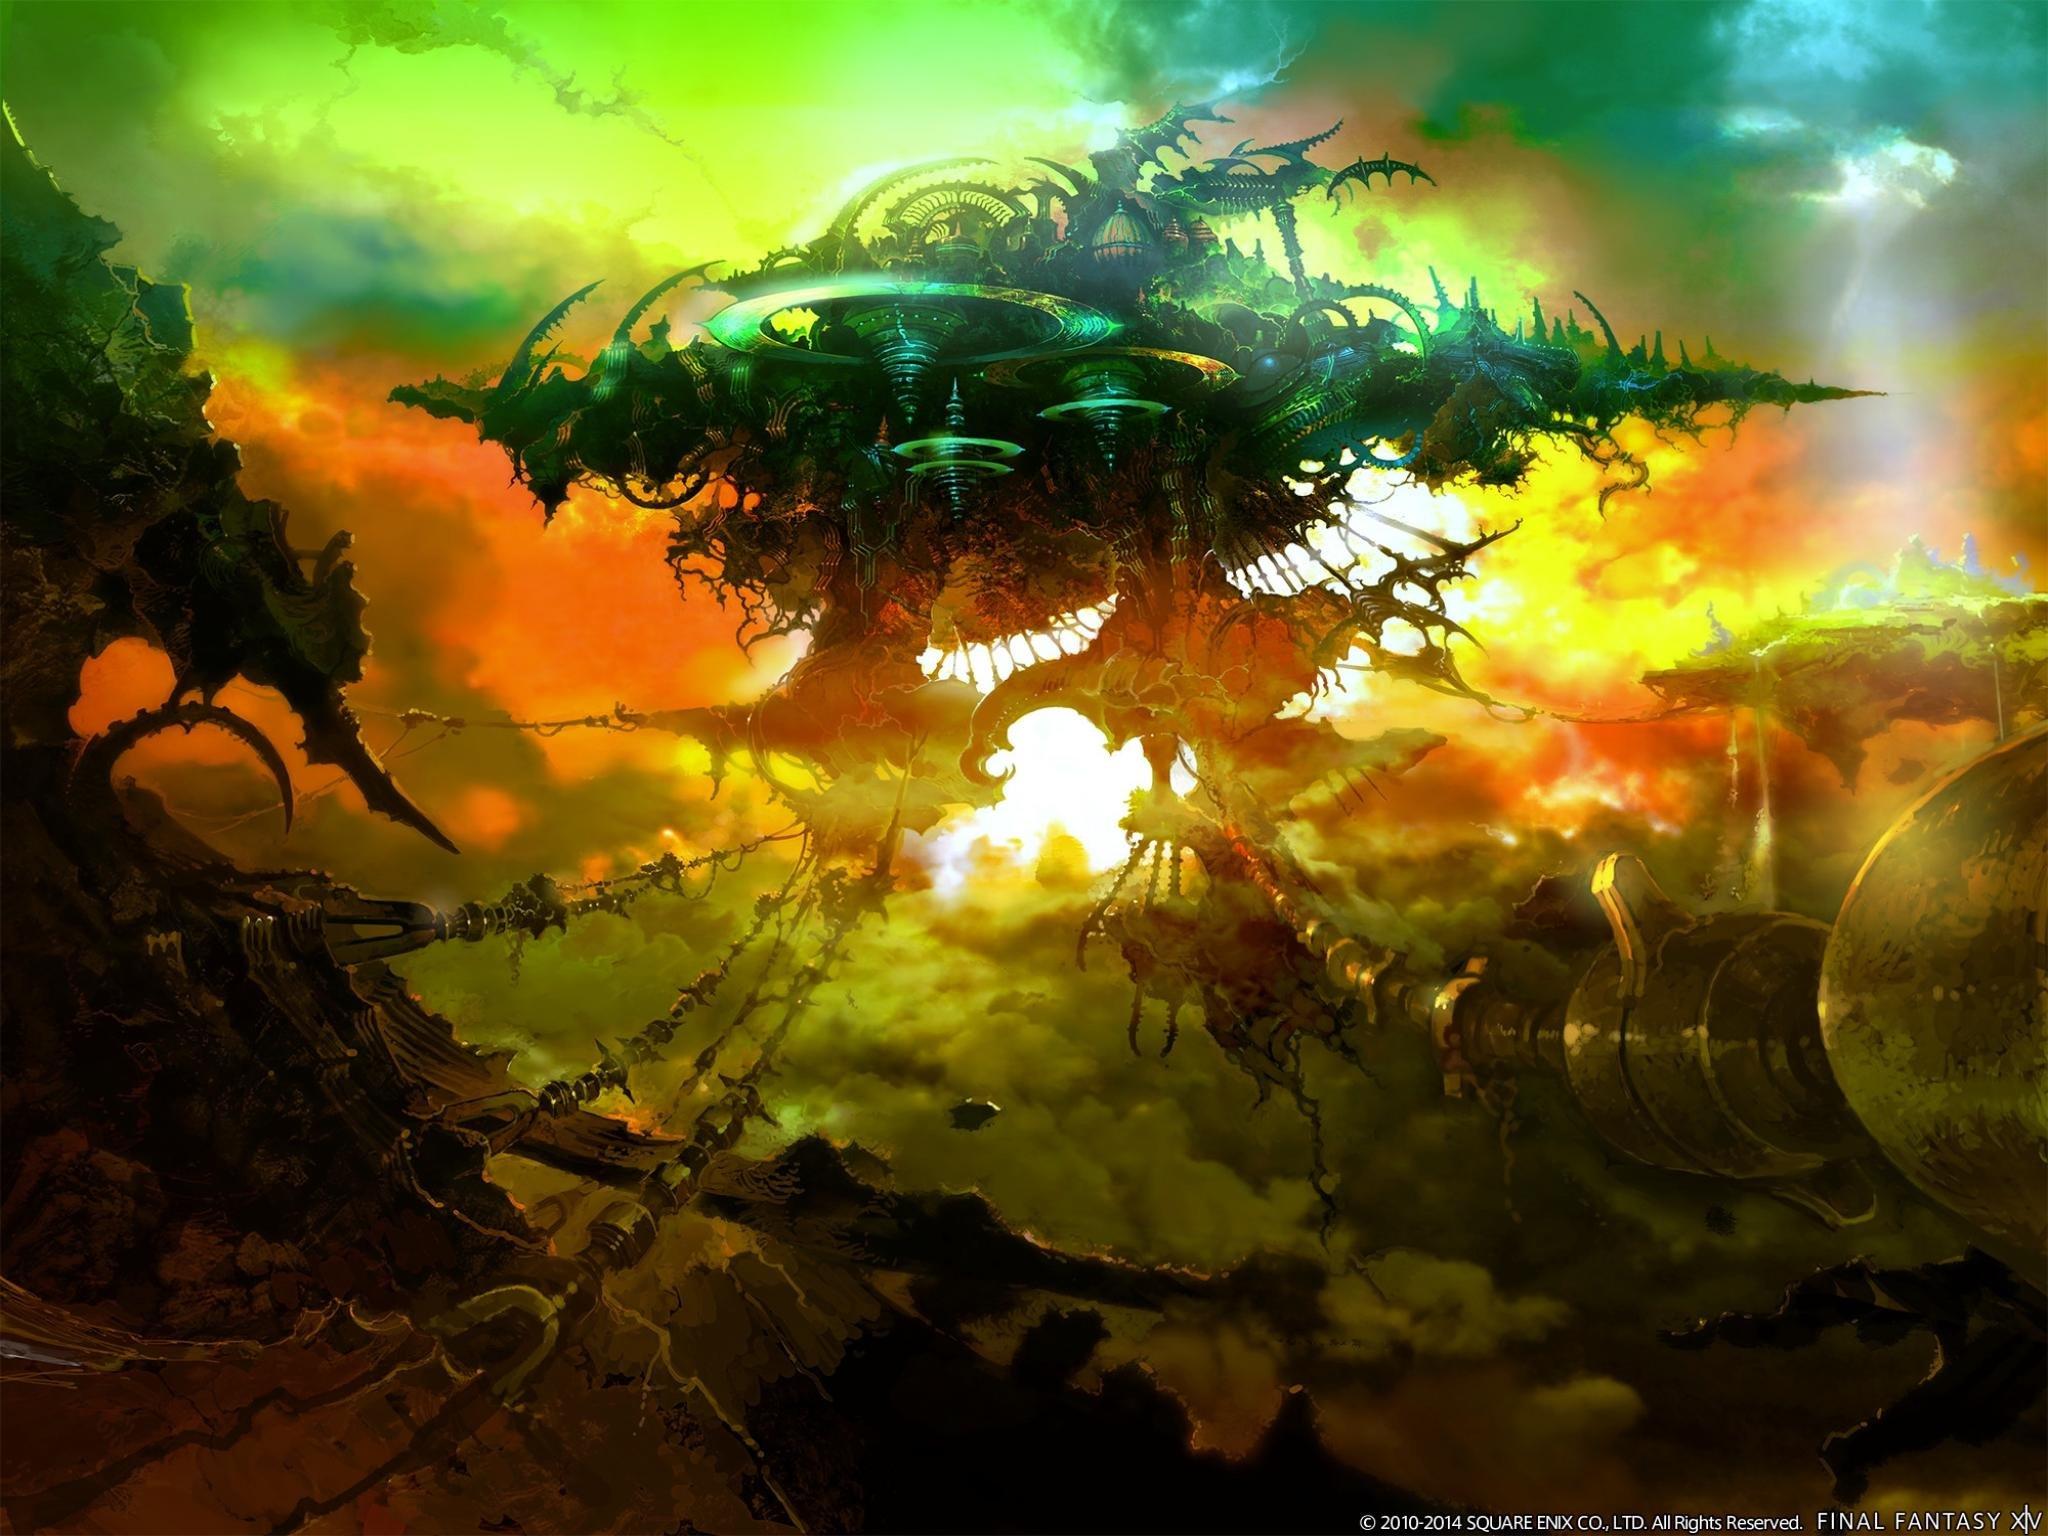 Final Fantasy Xiv Ff14 A Realm Reborn Wallpapers Hd For Desktop